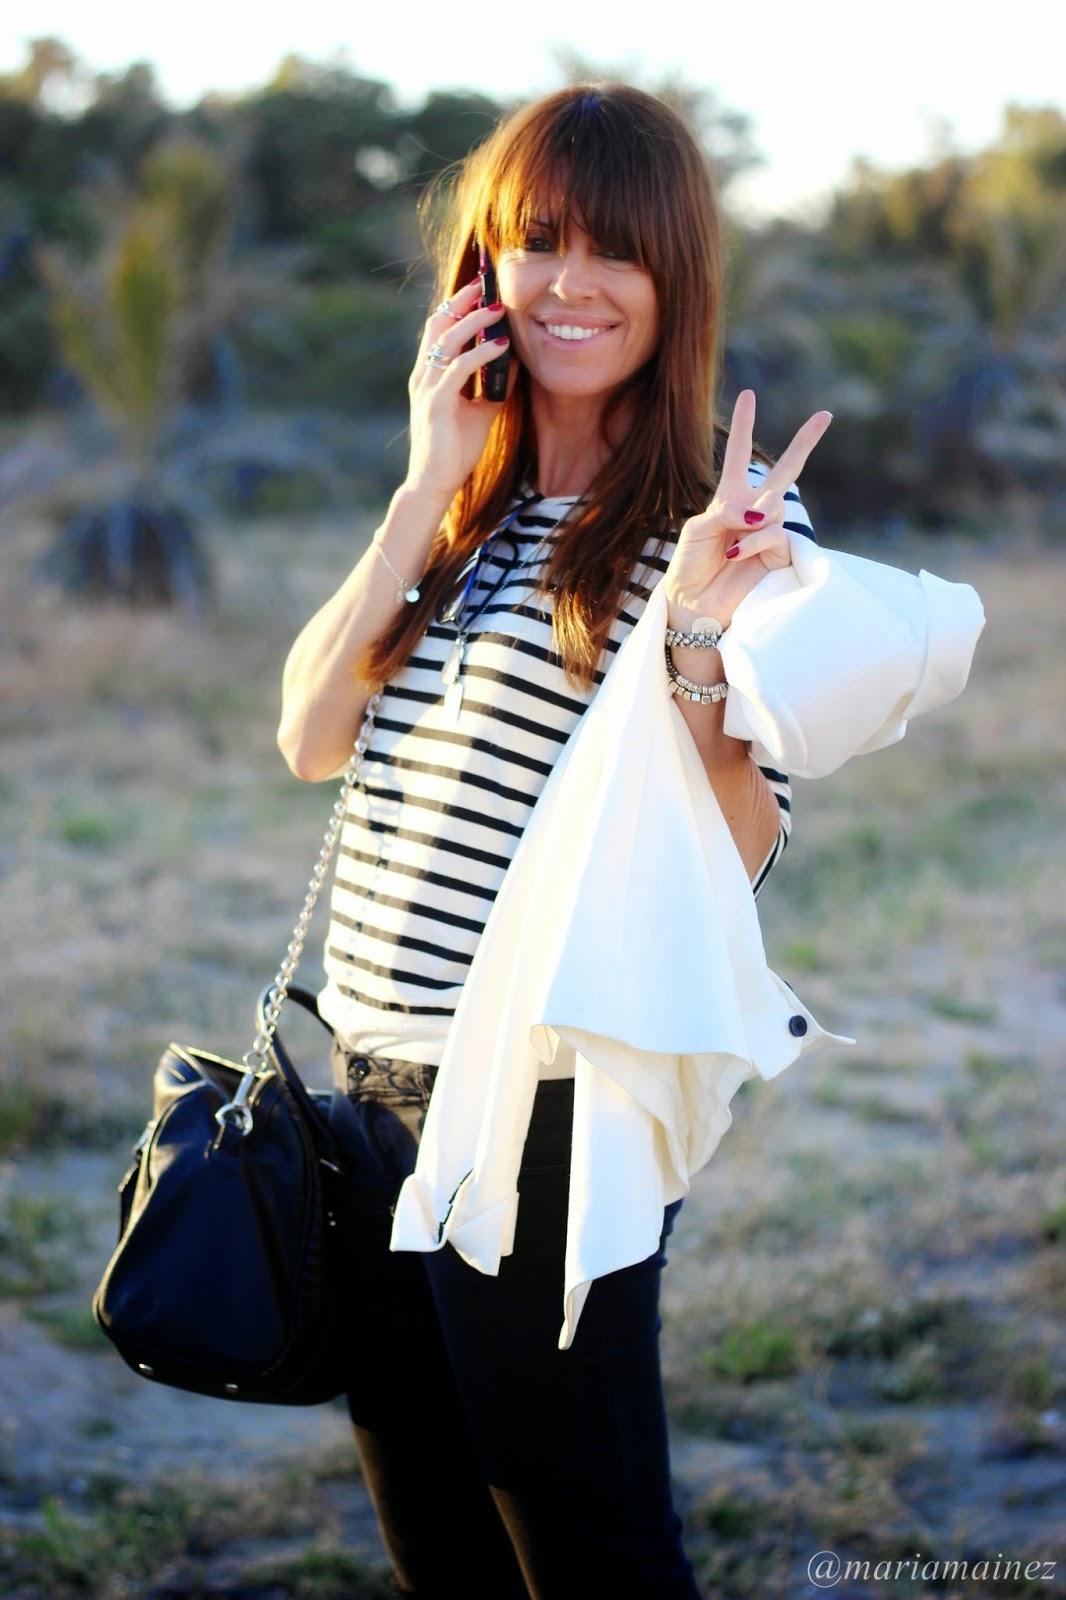 bucketfeet - blanco y negro outfit - fashion blogger - blazer blanca